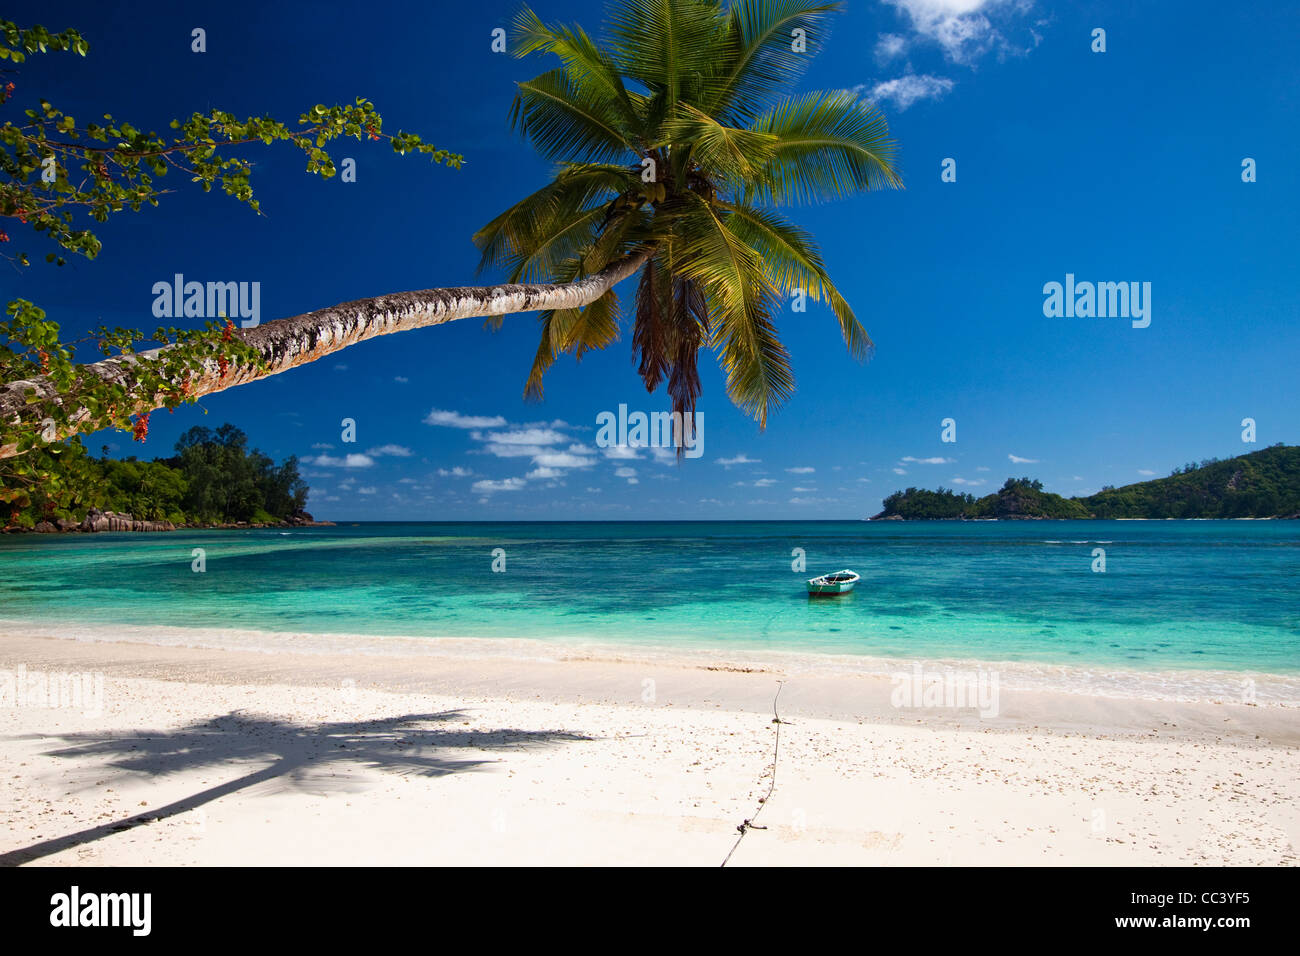 Anse Gaulettes beach, Baie Lazare, Mahe island, Seychelles - Stock Image